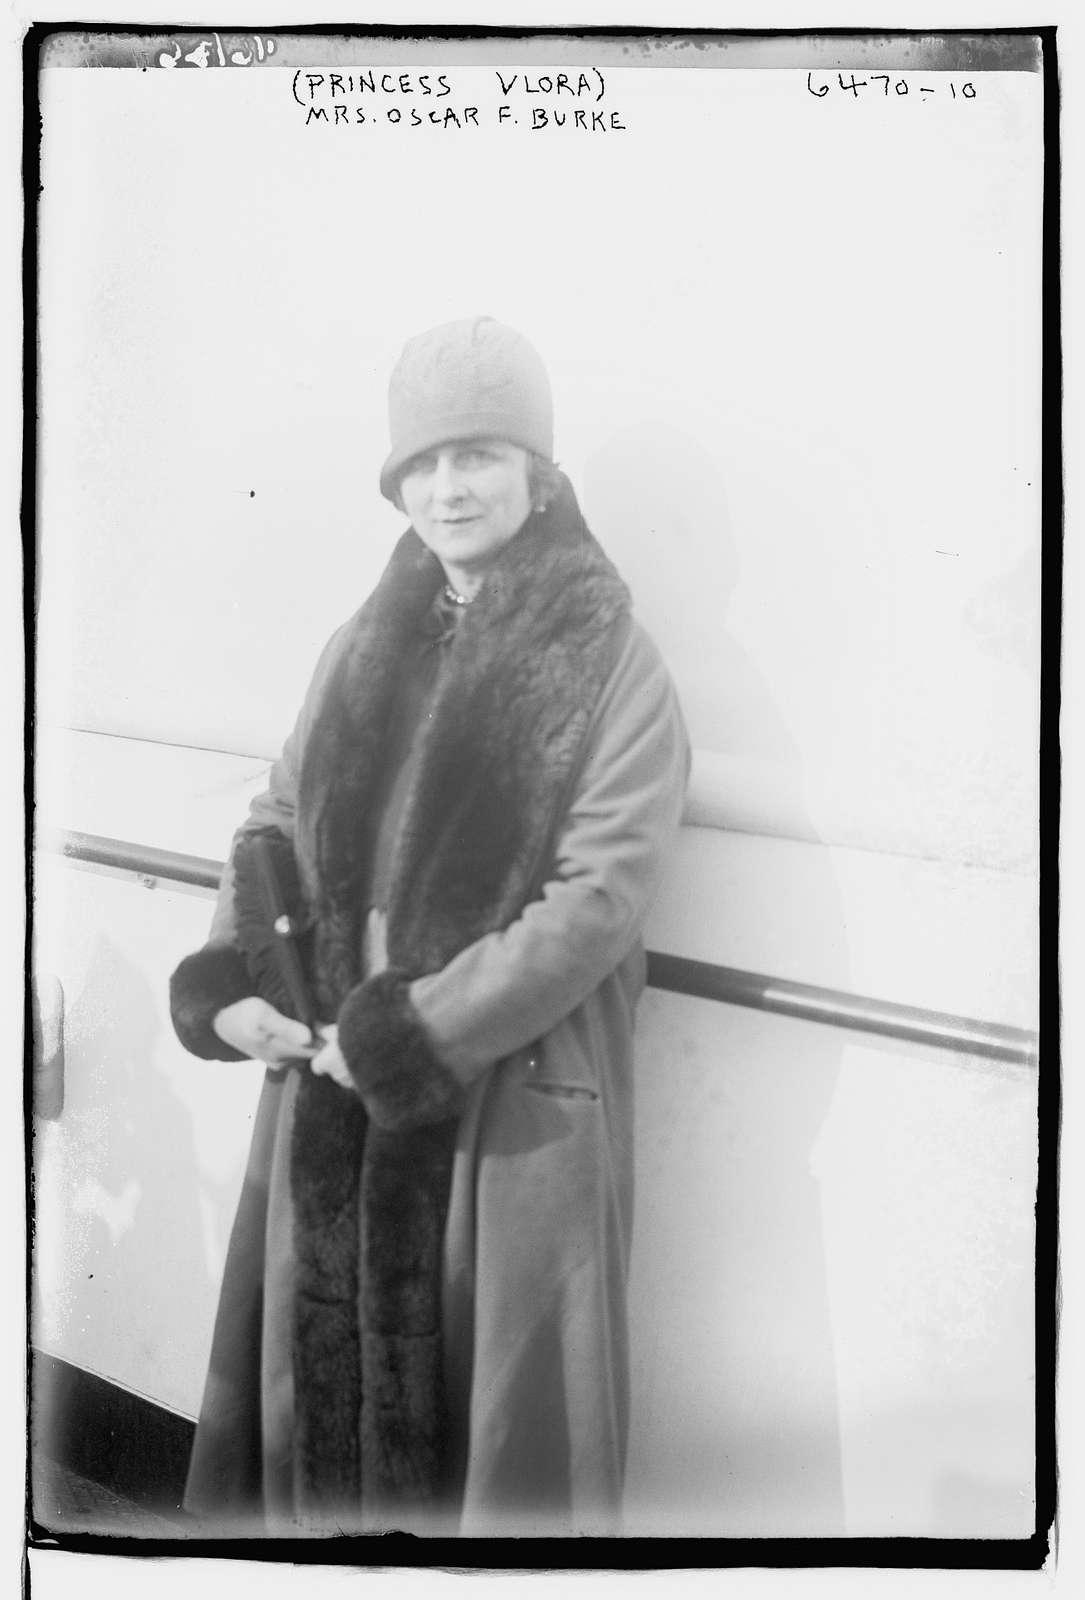 Princess Vlora (Mrs. Oscar F. Burke)